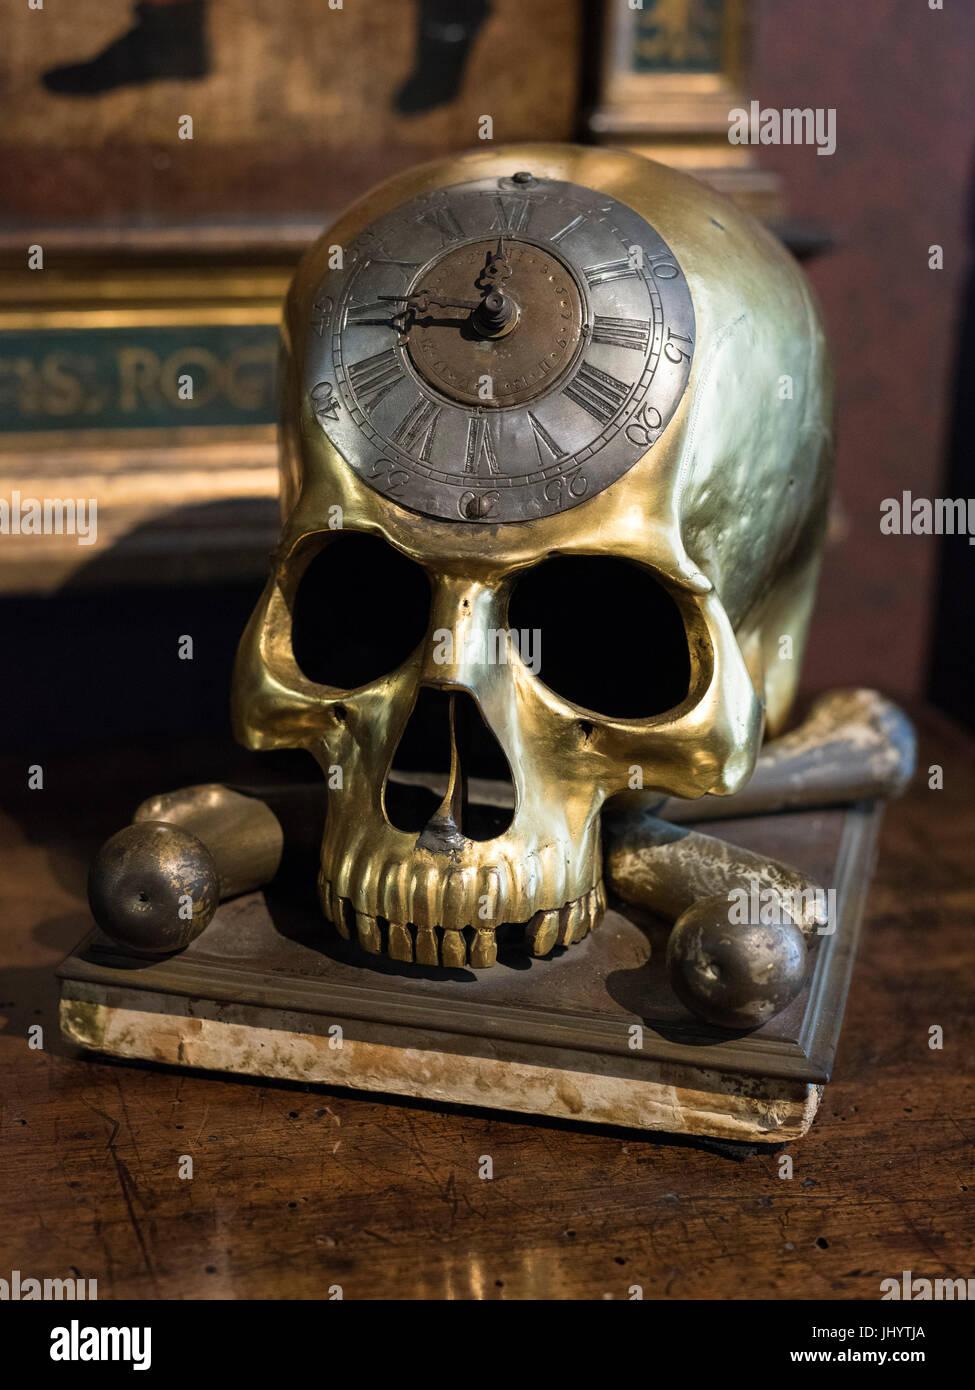 Milan. Italy. Museo Bagatti Valsecchi Museum, 'Memento mori' skull and crossbones clock at Fausto Bagatti - Stock Image